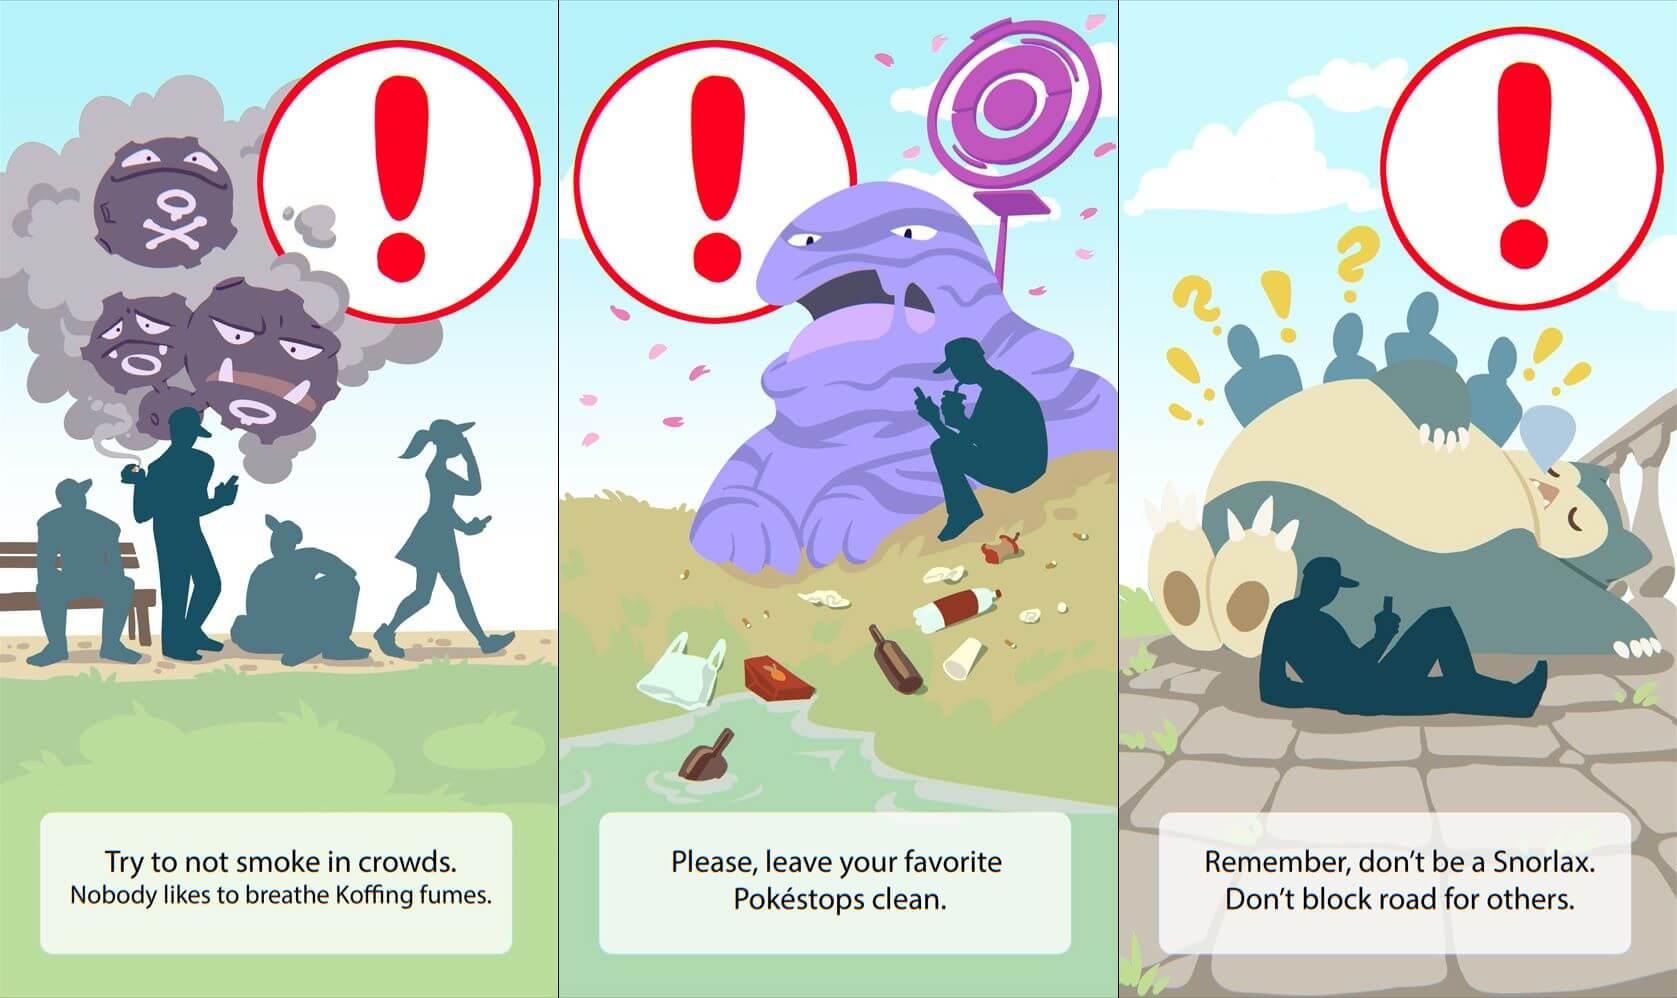 pokemon go how to use pokestops